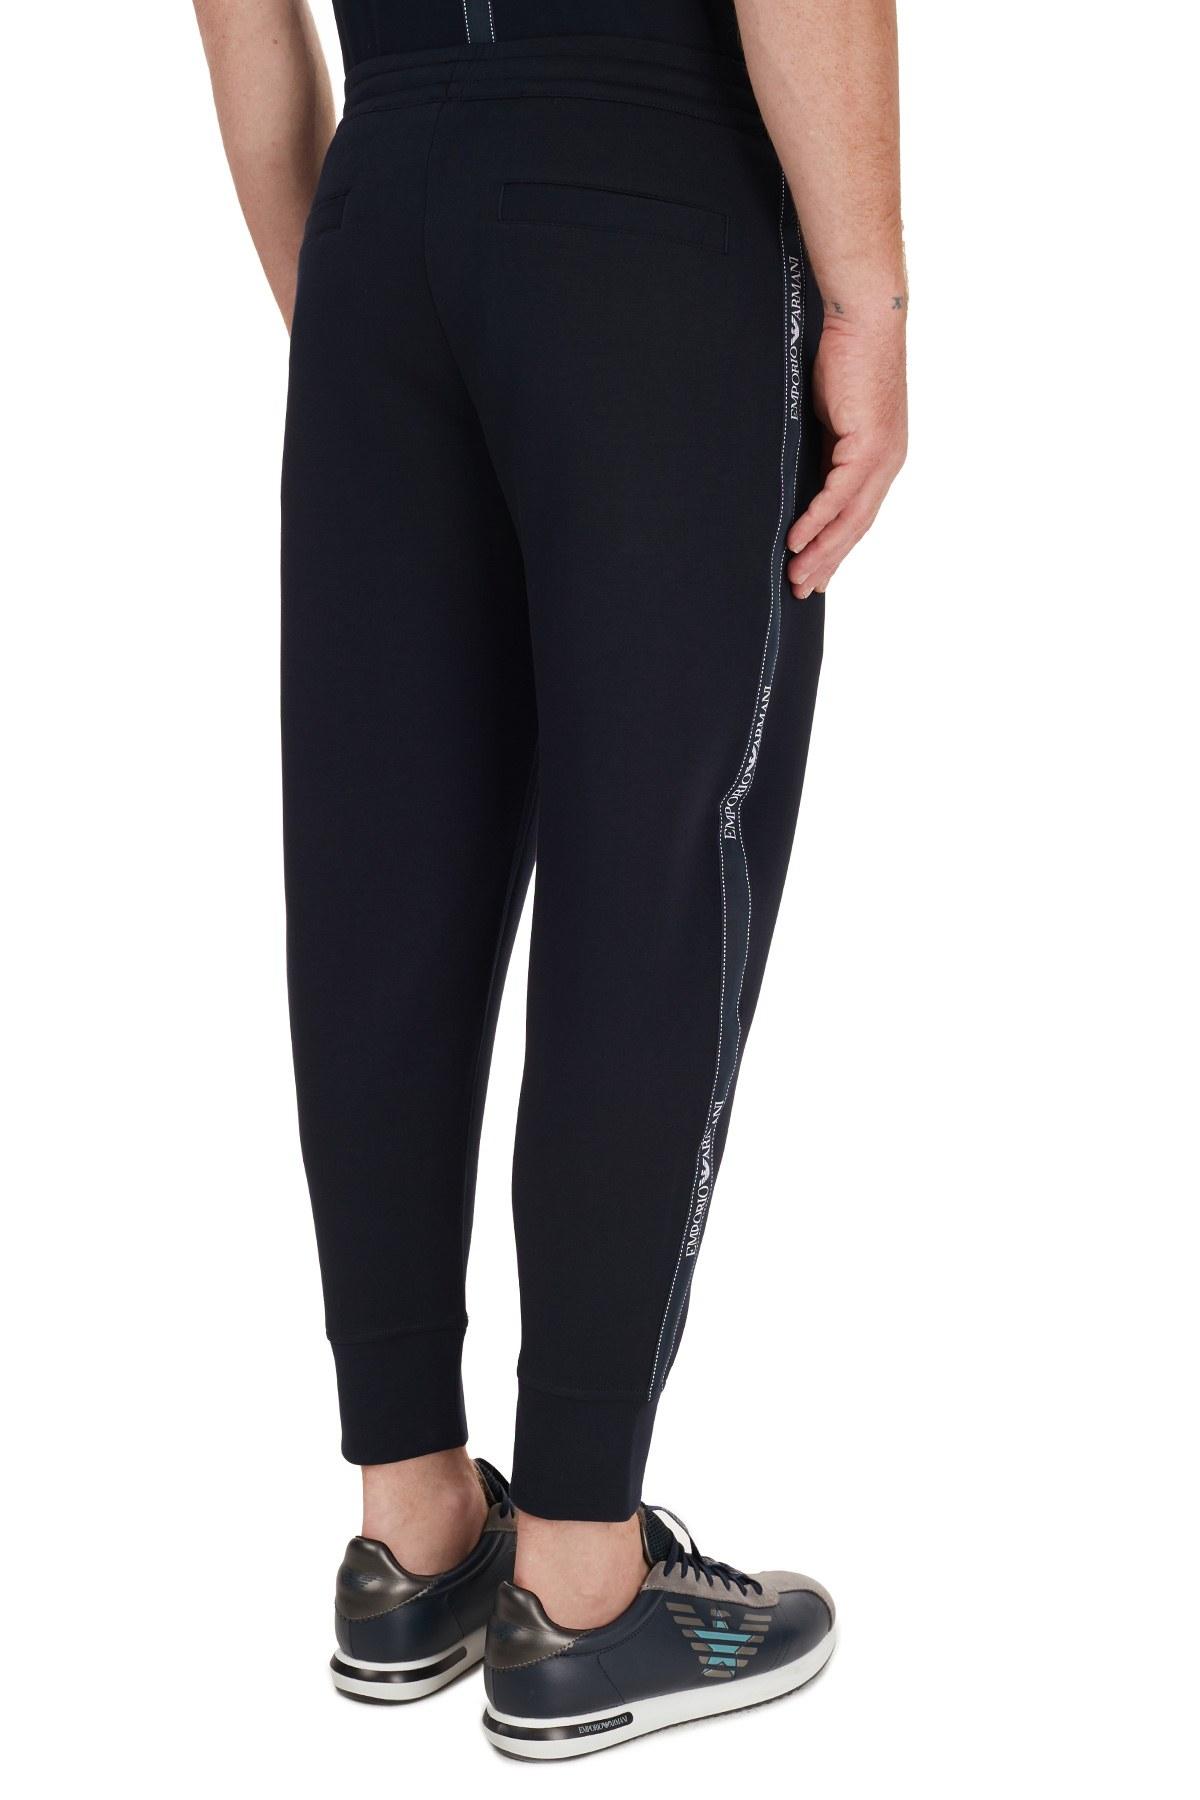 Emporio Armani Logo Bantlı Pamuklu Jogger Erkek Pantolon 6H1P50 1JHSZ 0920 LACİVERT